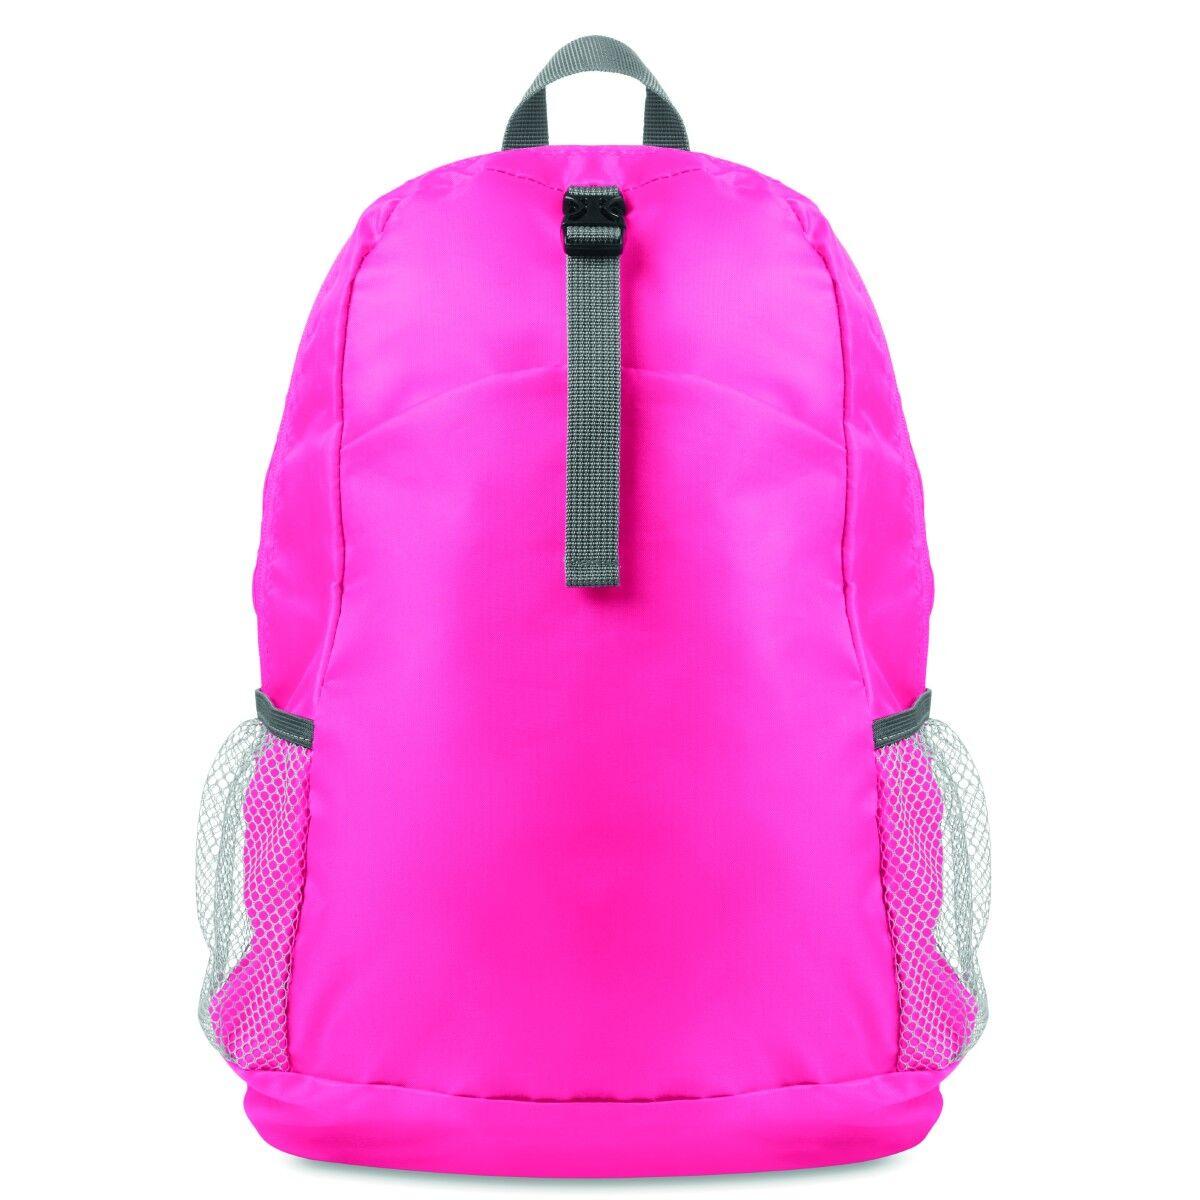 Fully Customised Foldable Backpack